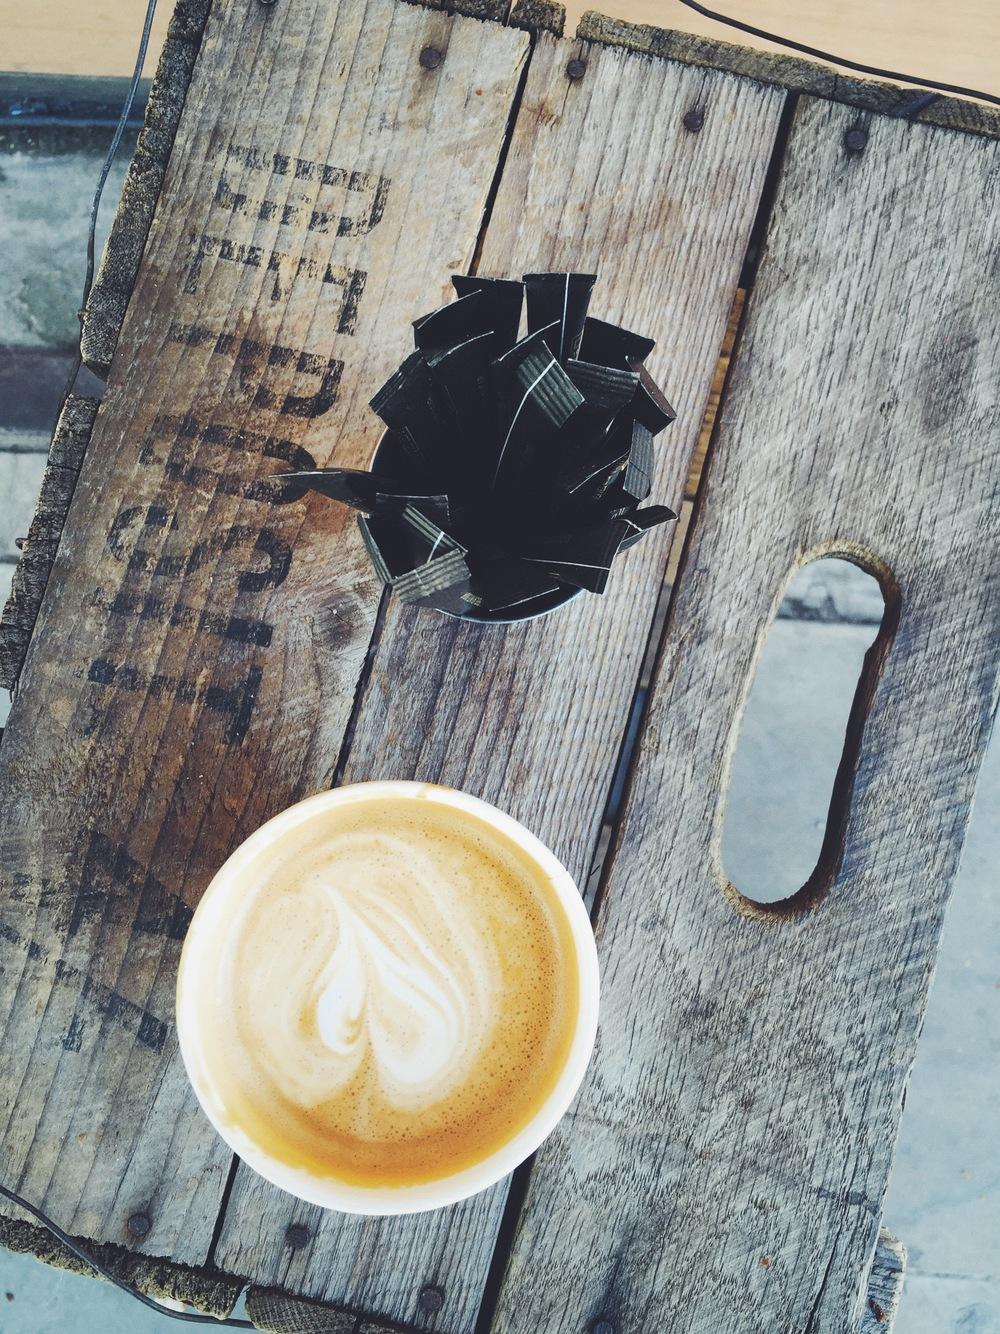 Flat White at Allpress Espresso